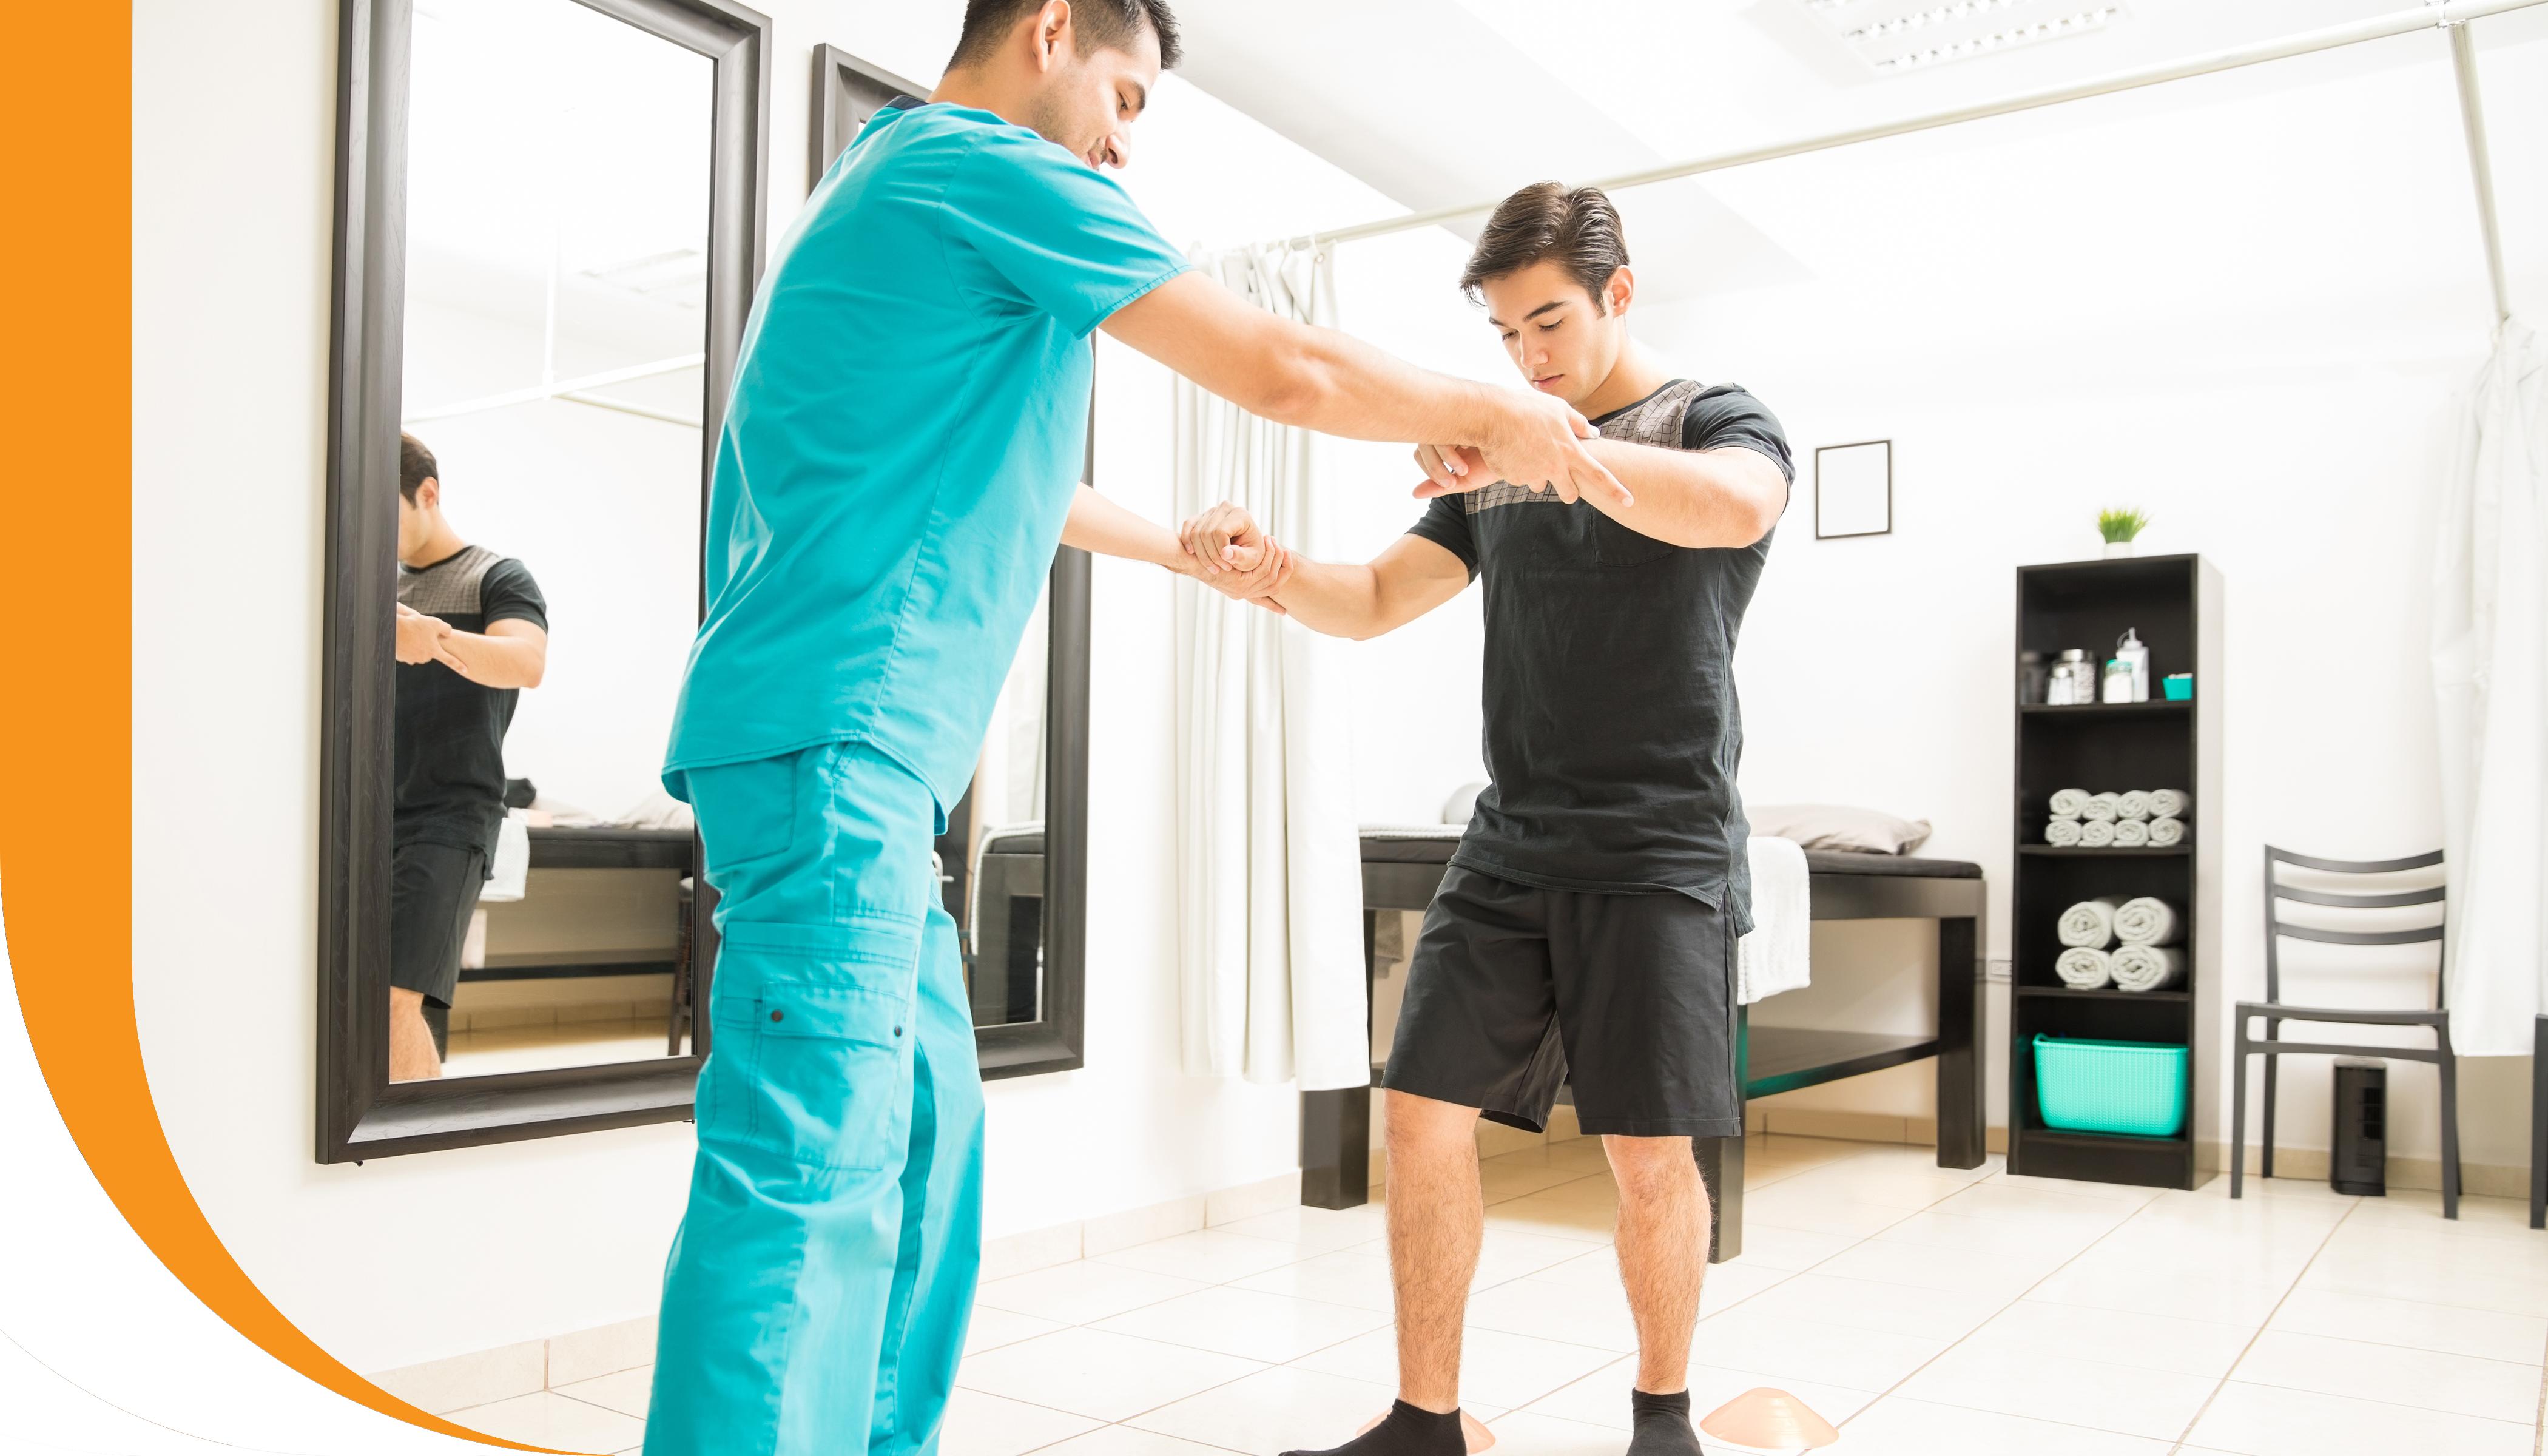 A patient receiving assistance with neurological retraining.